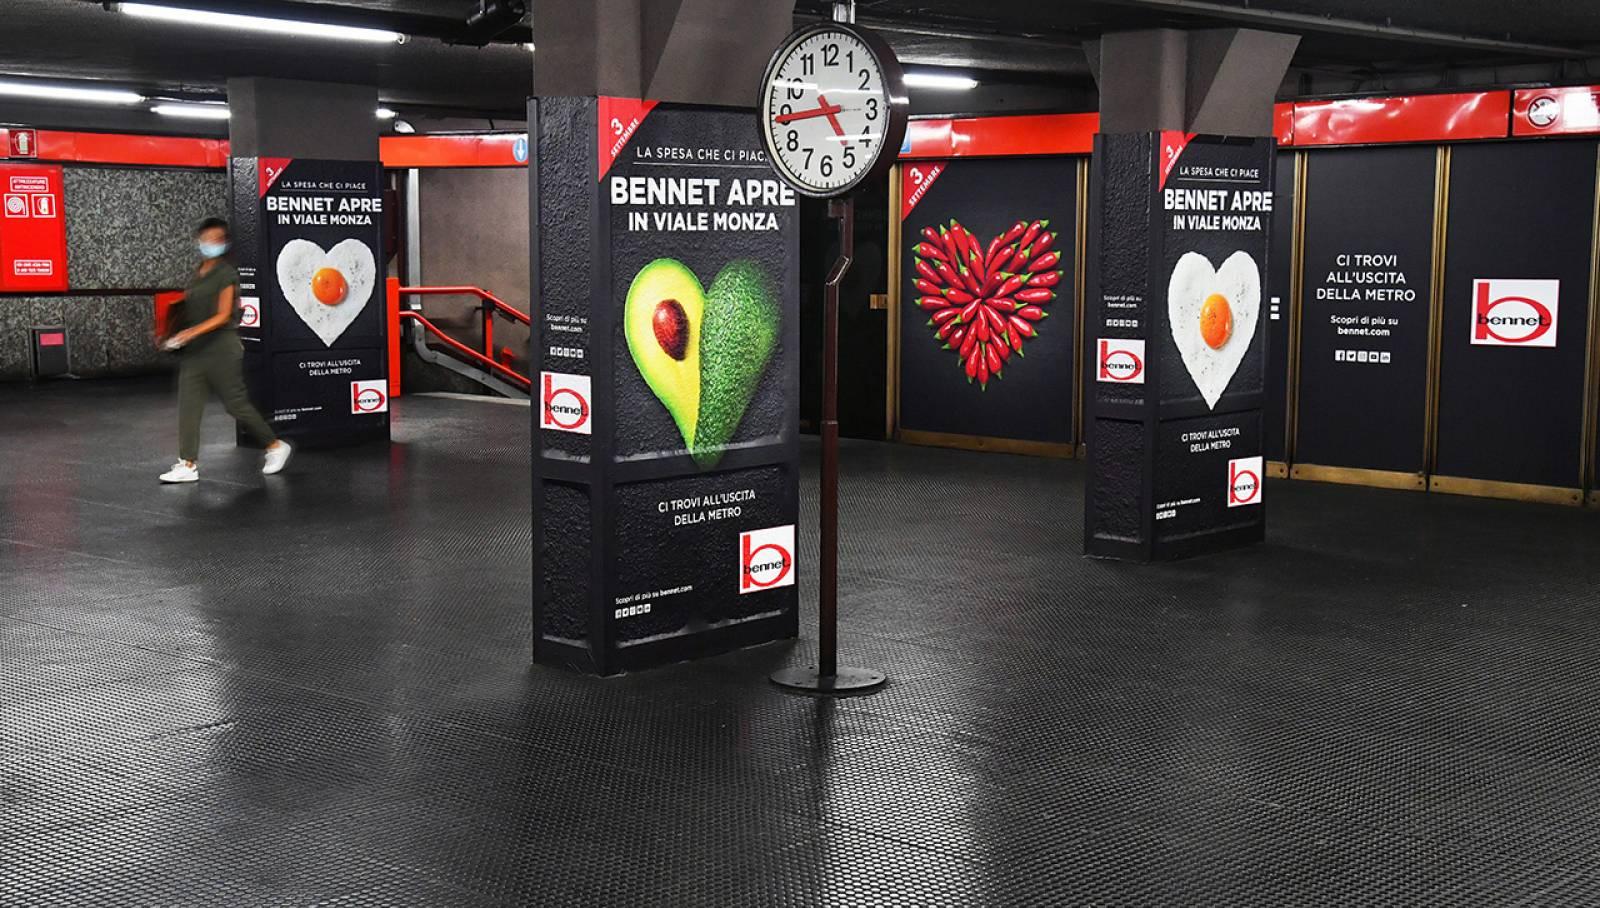 Pubblicità in metropolitana IGPDecaux a Milano Station Domination per Bennet